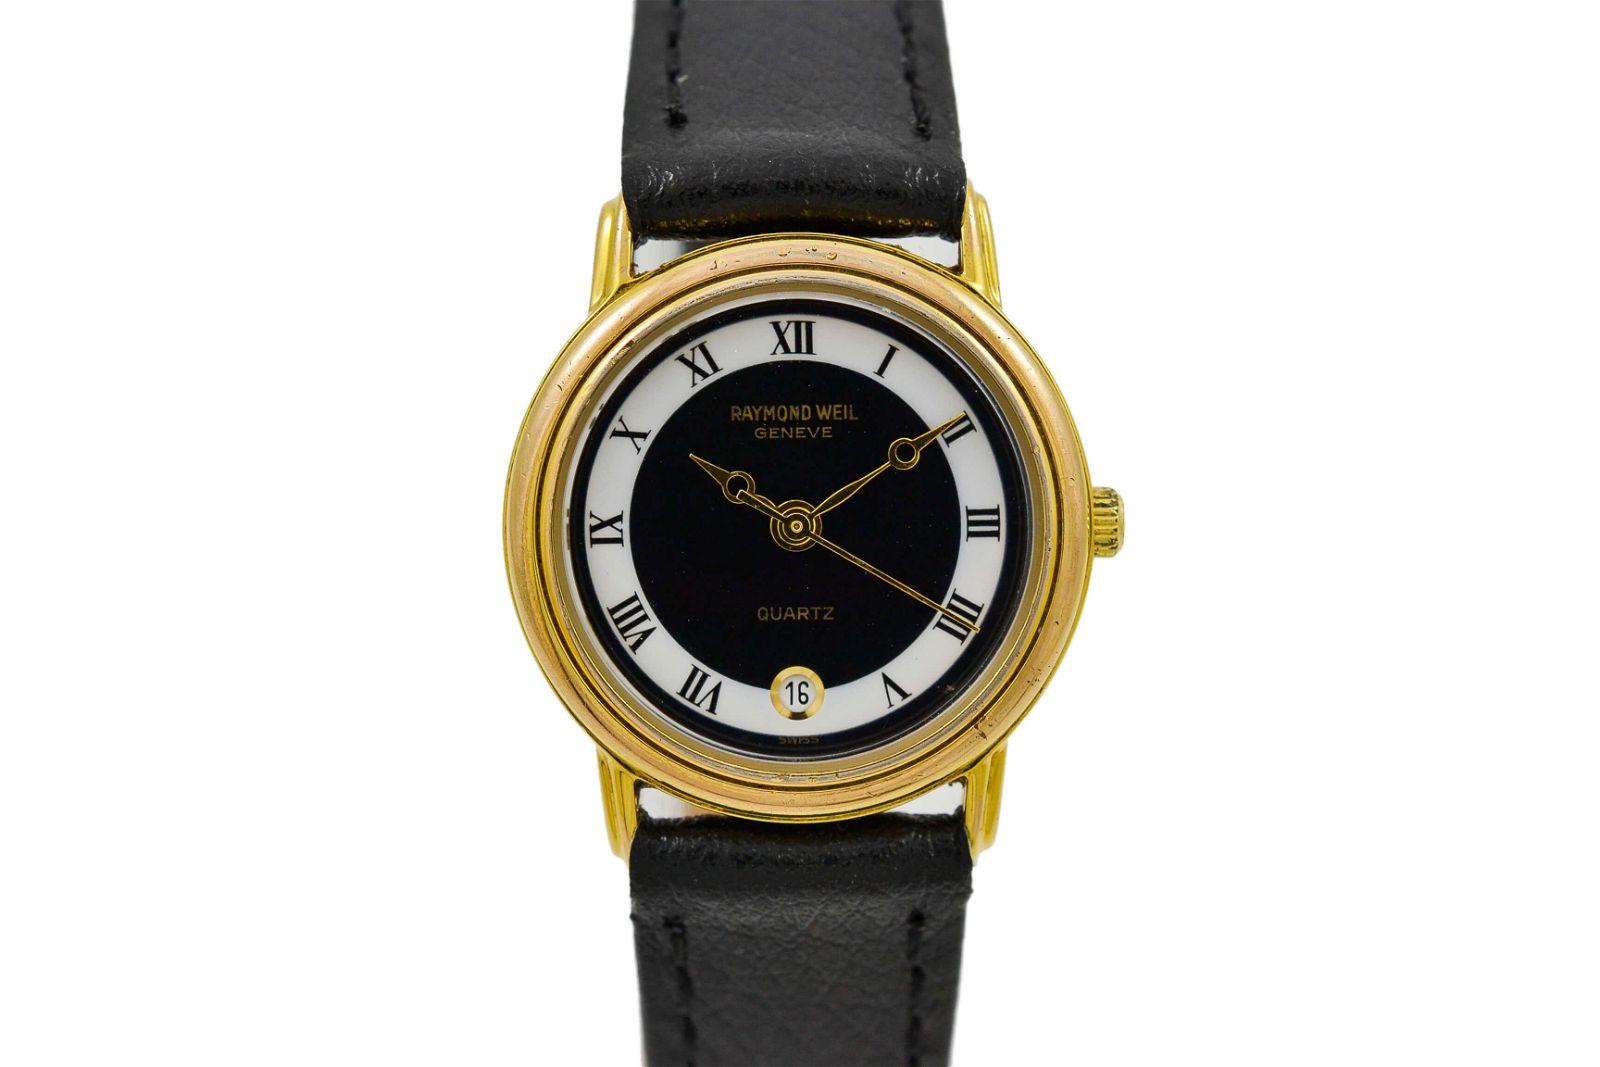 Raymond Weil Geneve 5332 Quartz Ladies Watch